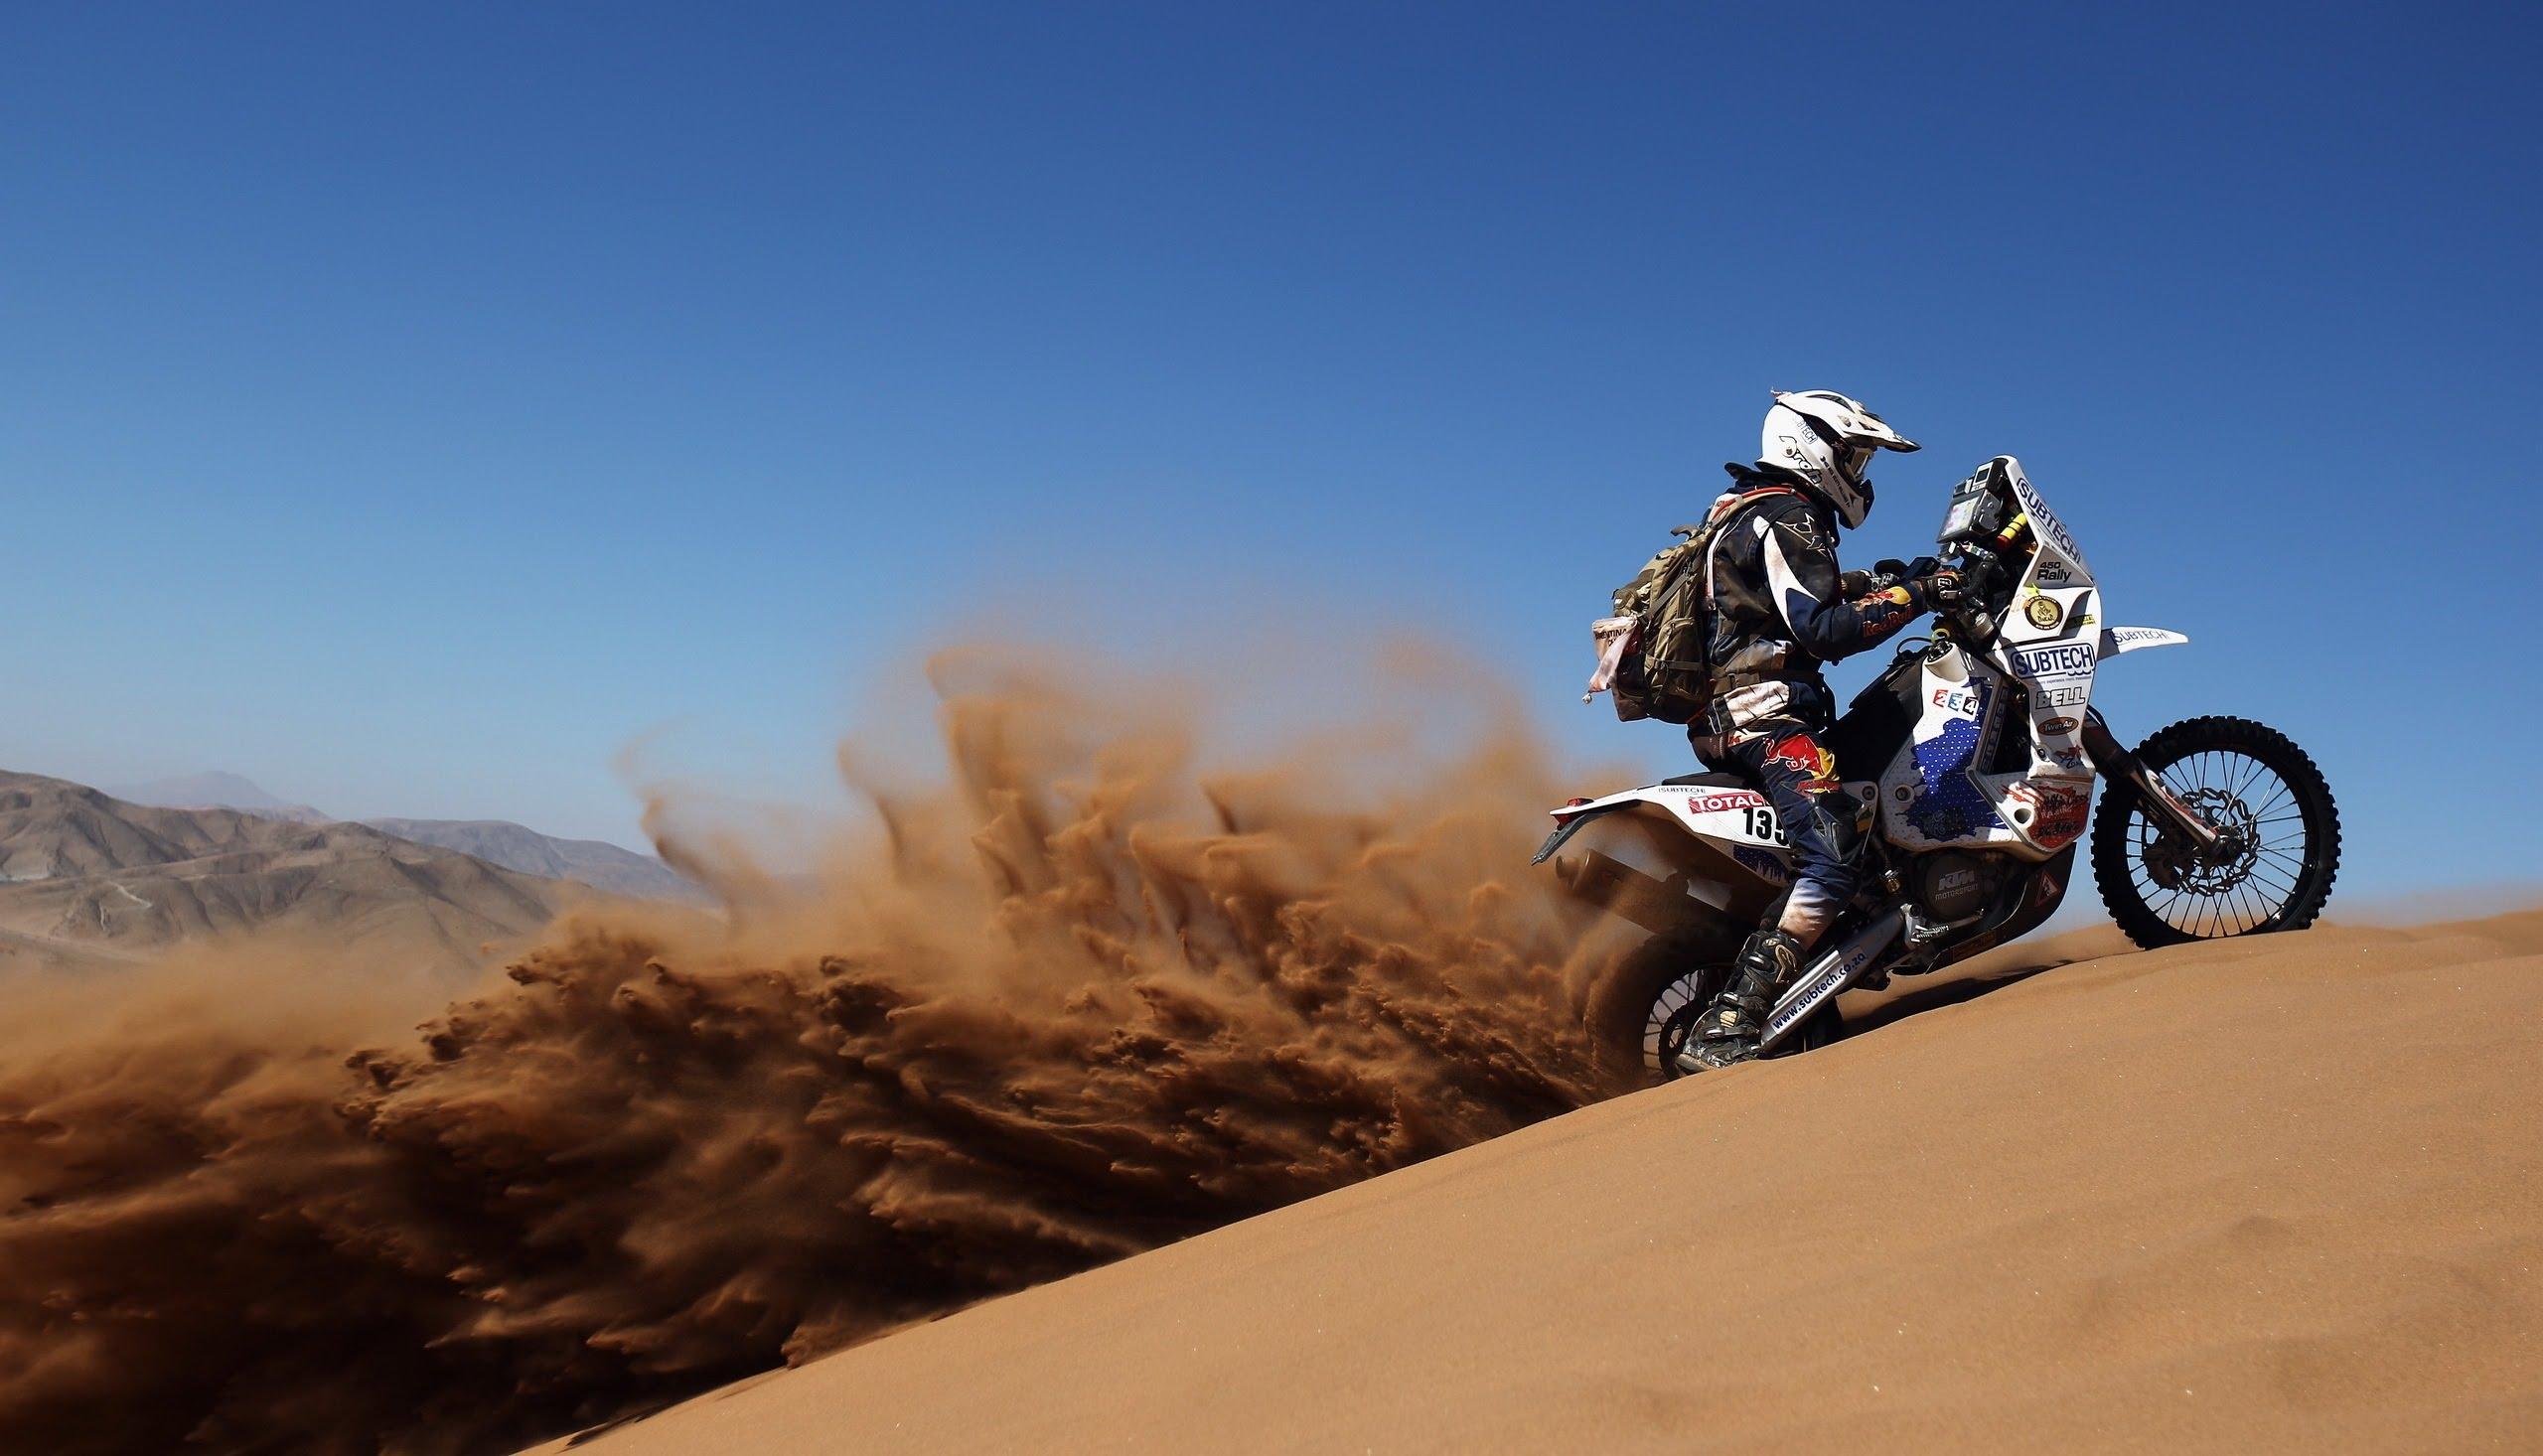 Dakar Rally High Quality Background on Wallpapers Vista